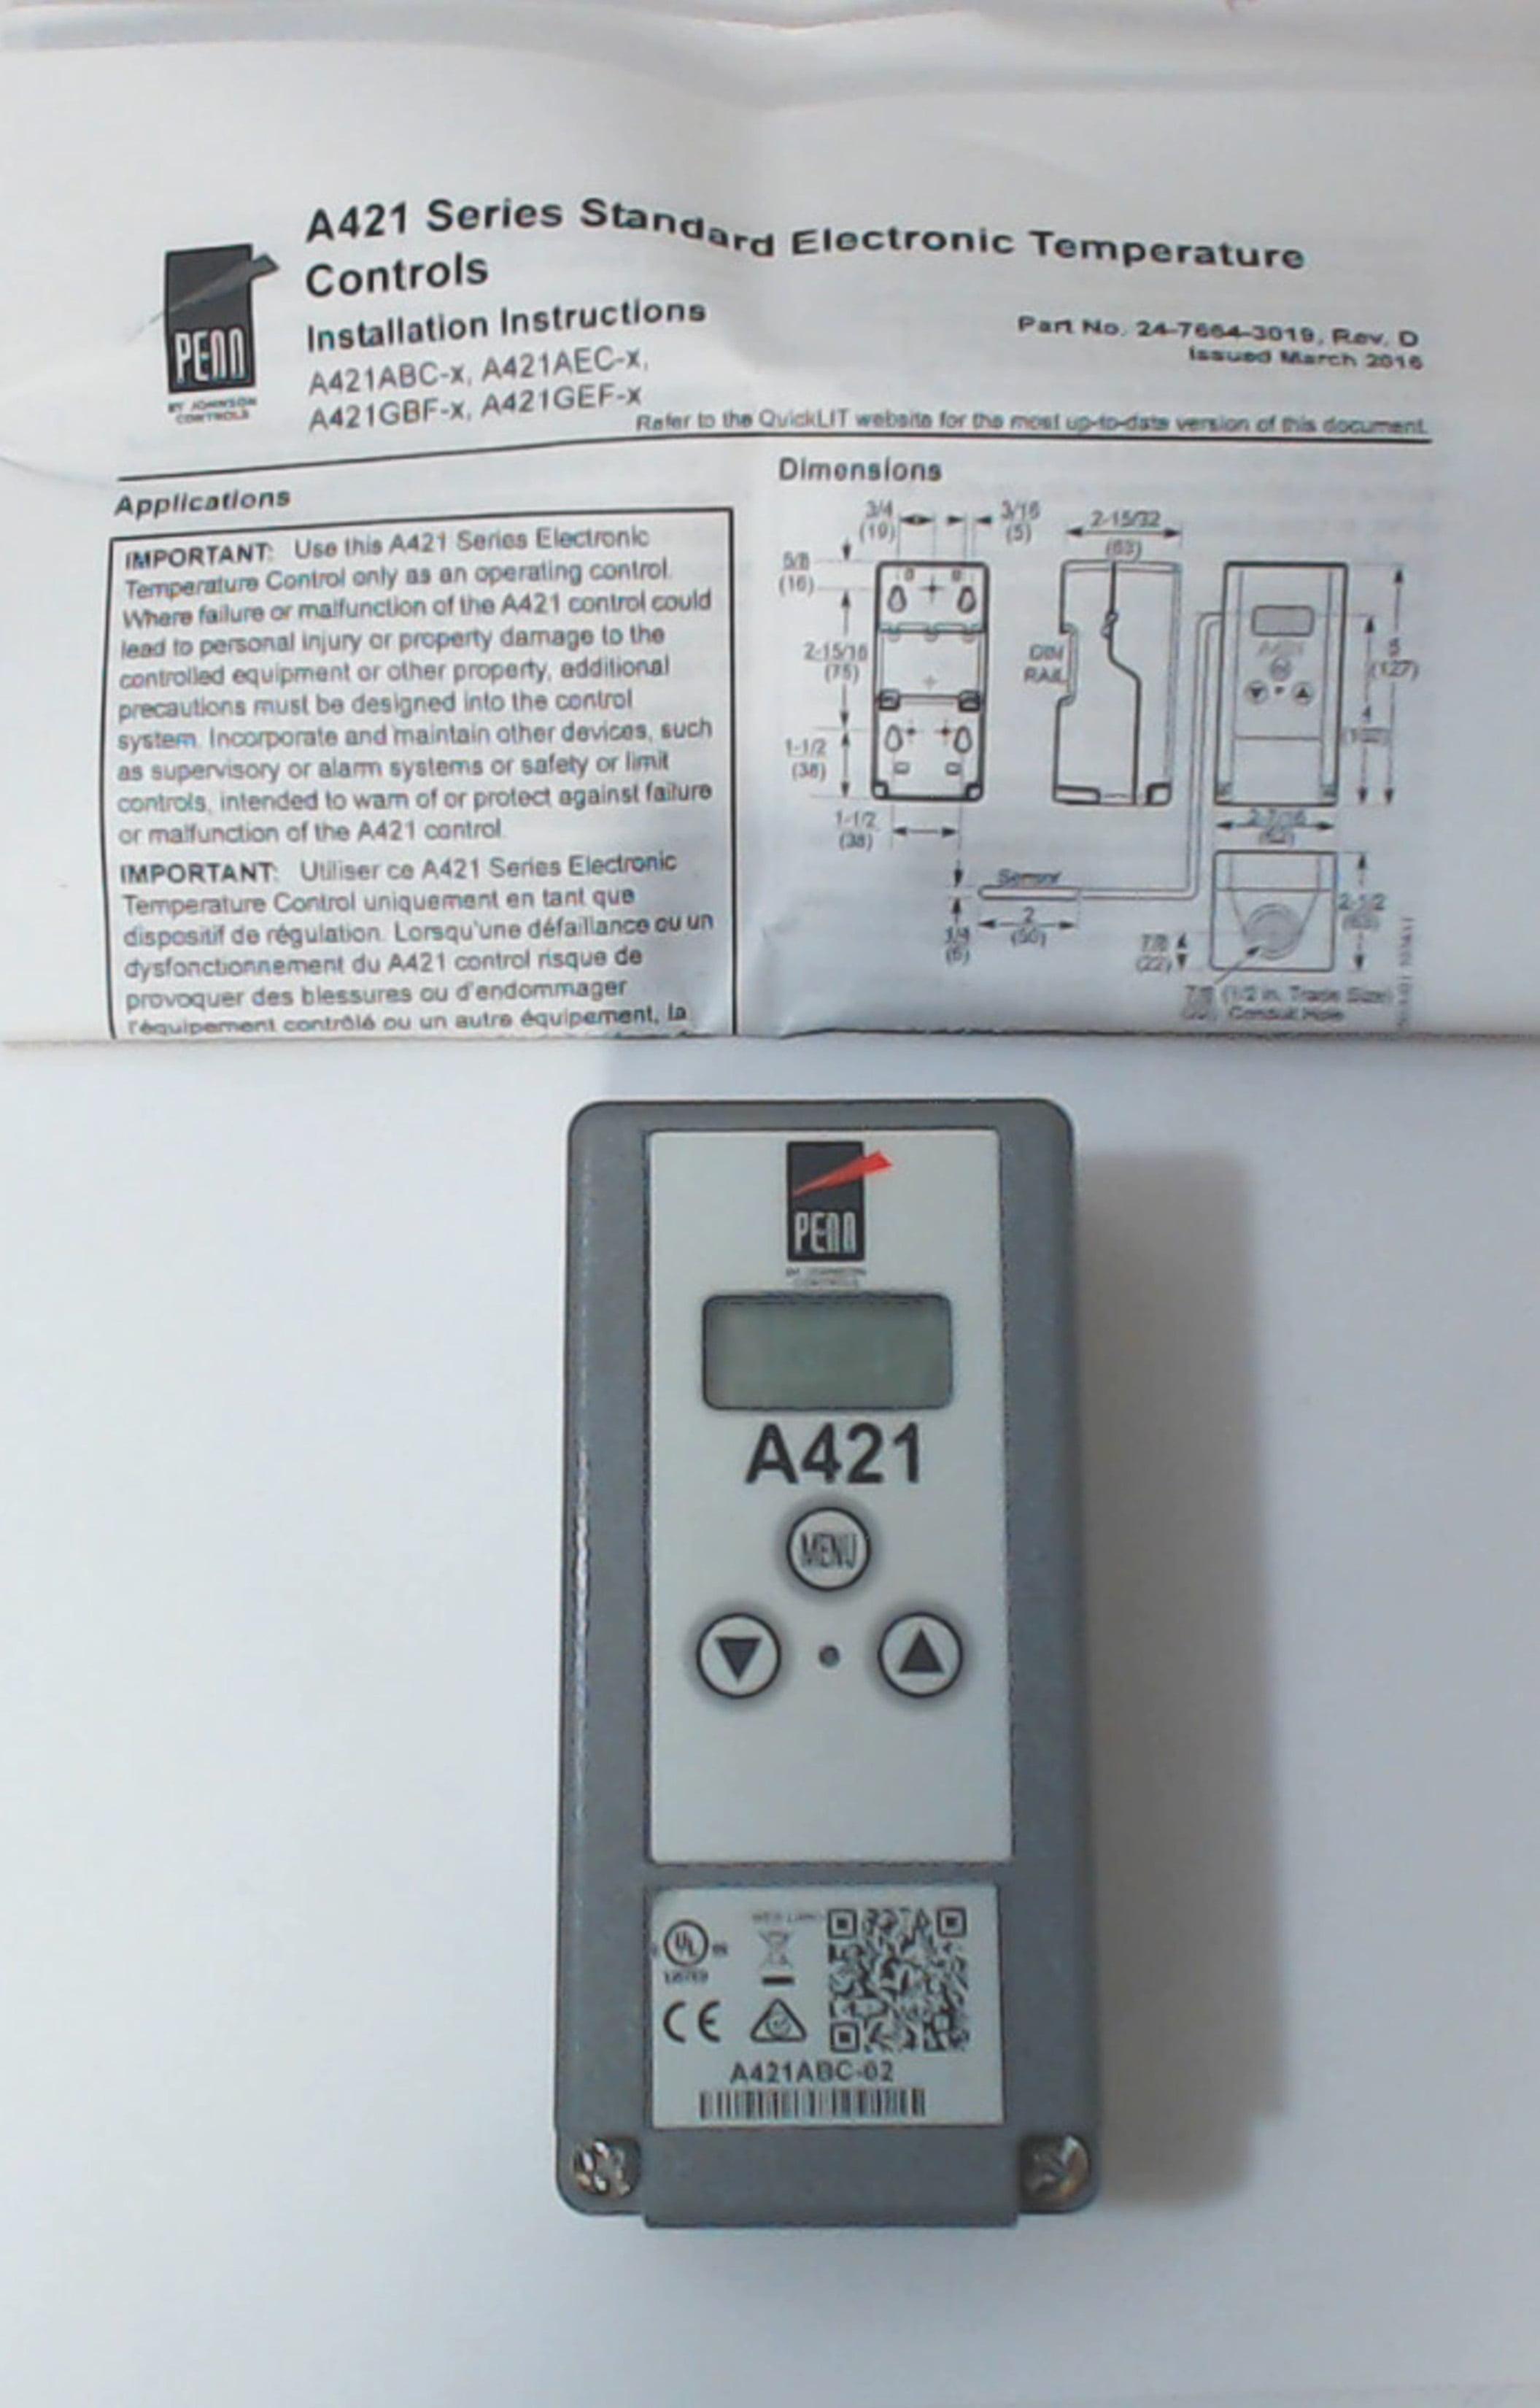 FOR 9mm SHANK TAPS TM-SMITH BILZ #1 TORQUE CONTROL TAP ADAPTER-COLLET 61-40900